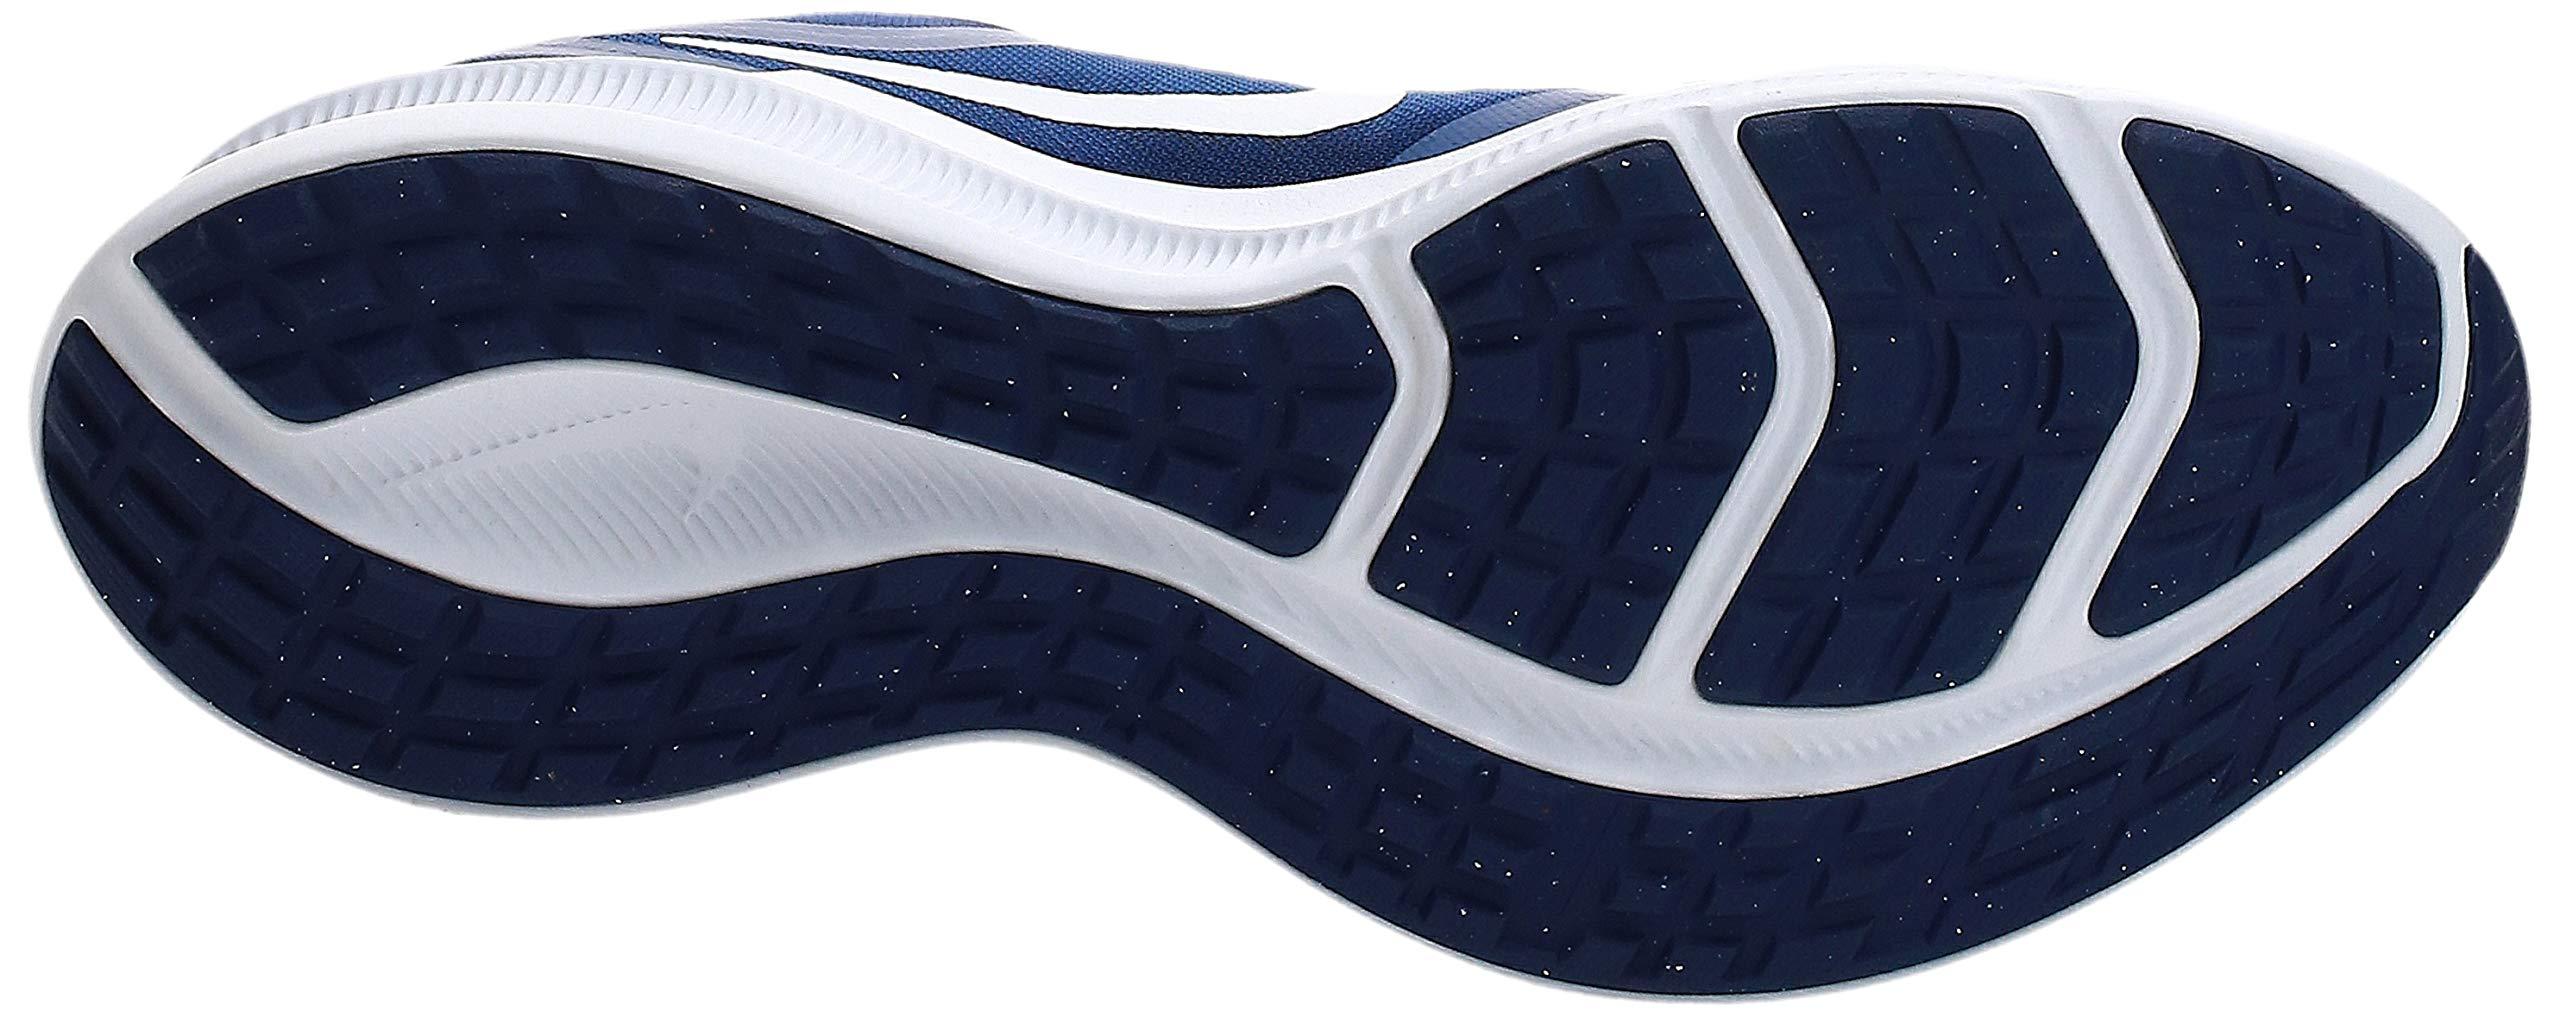 Nike Downshifter 10 Men's Men Road Running Shoes